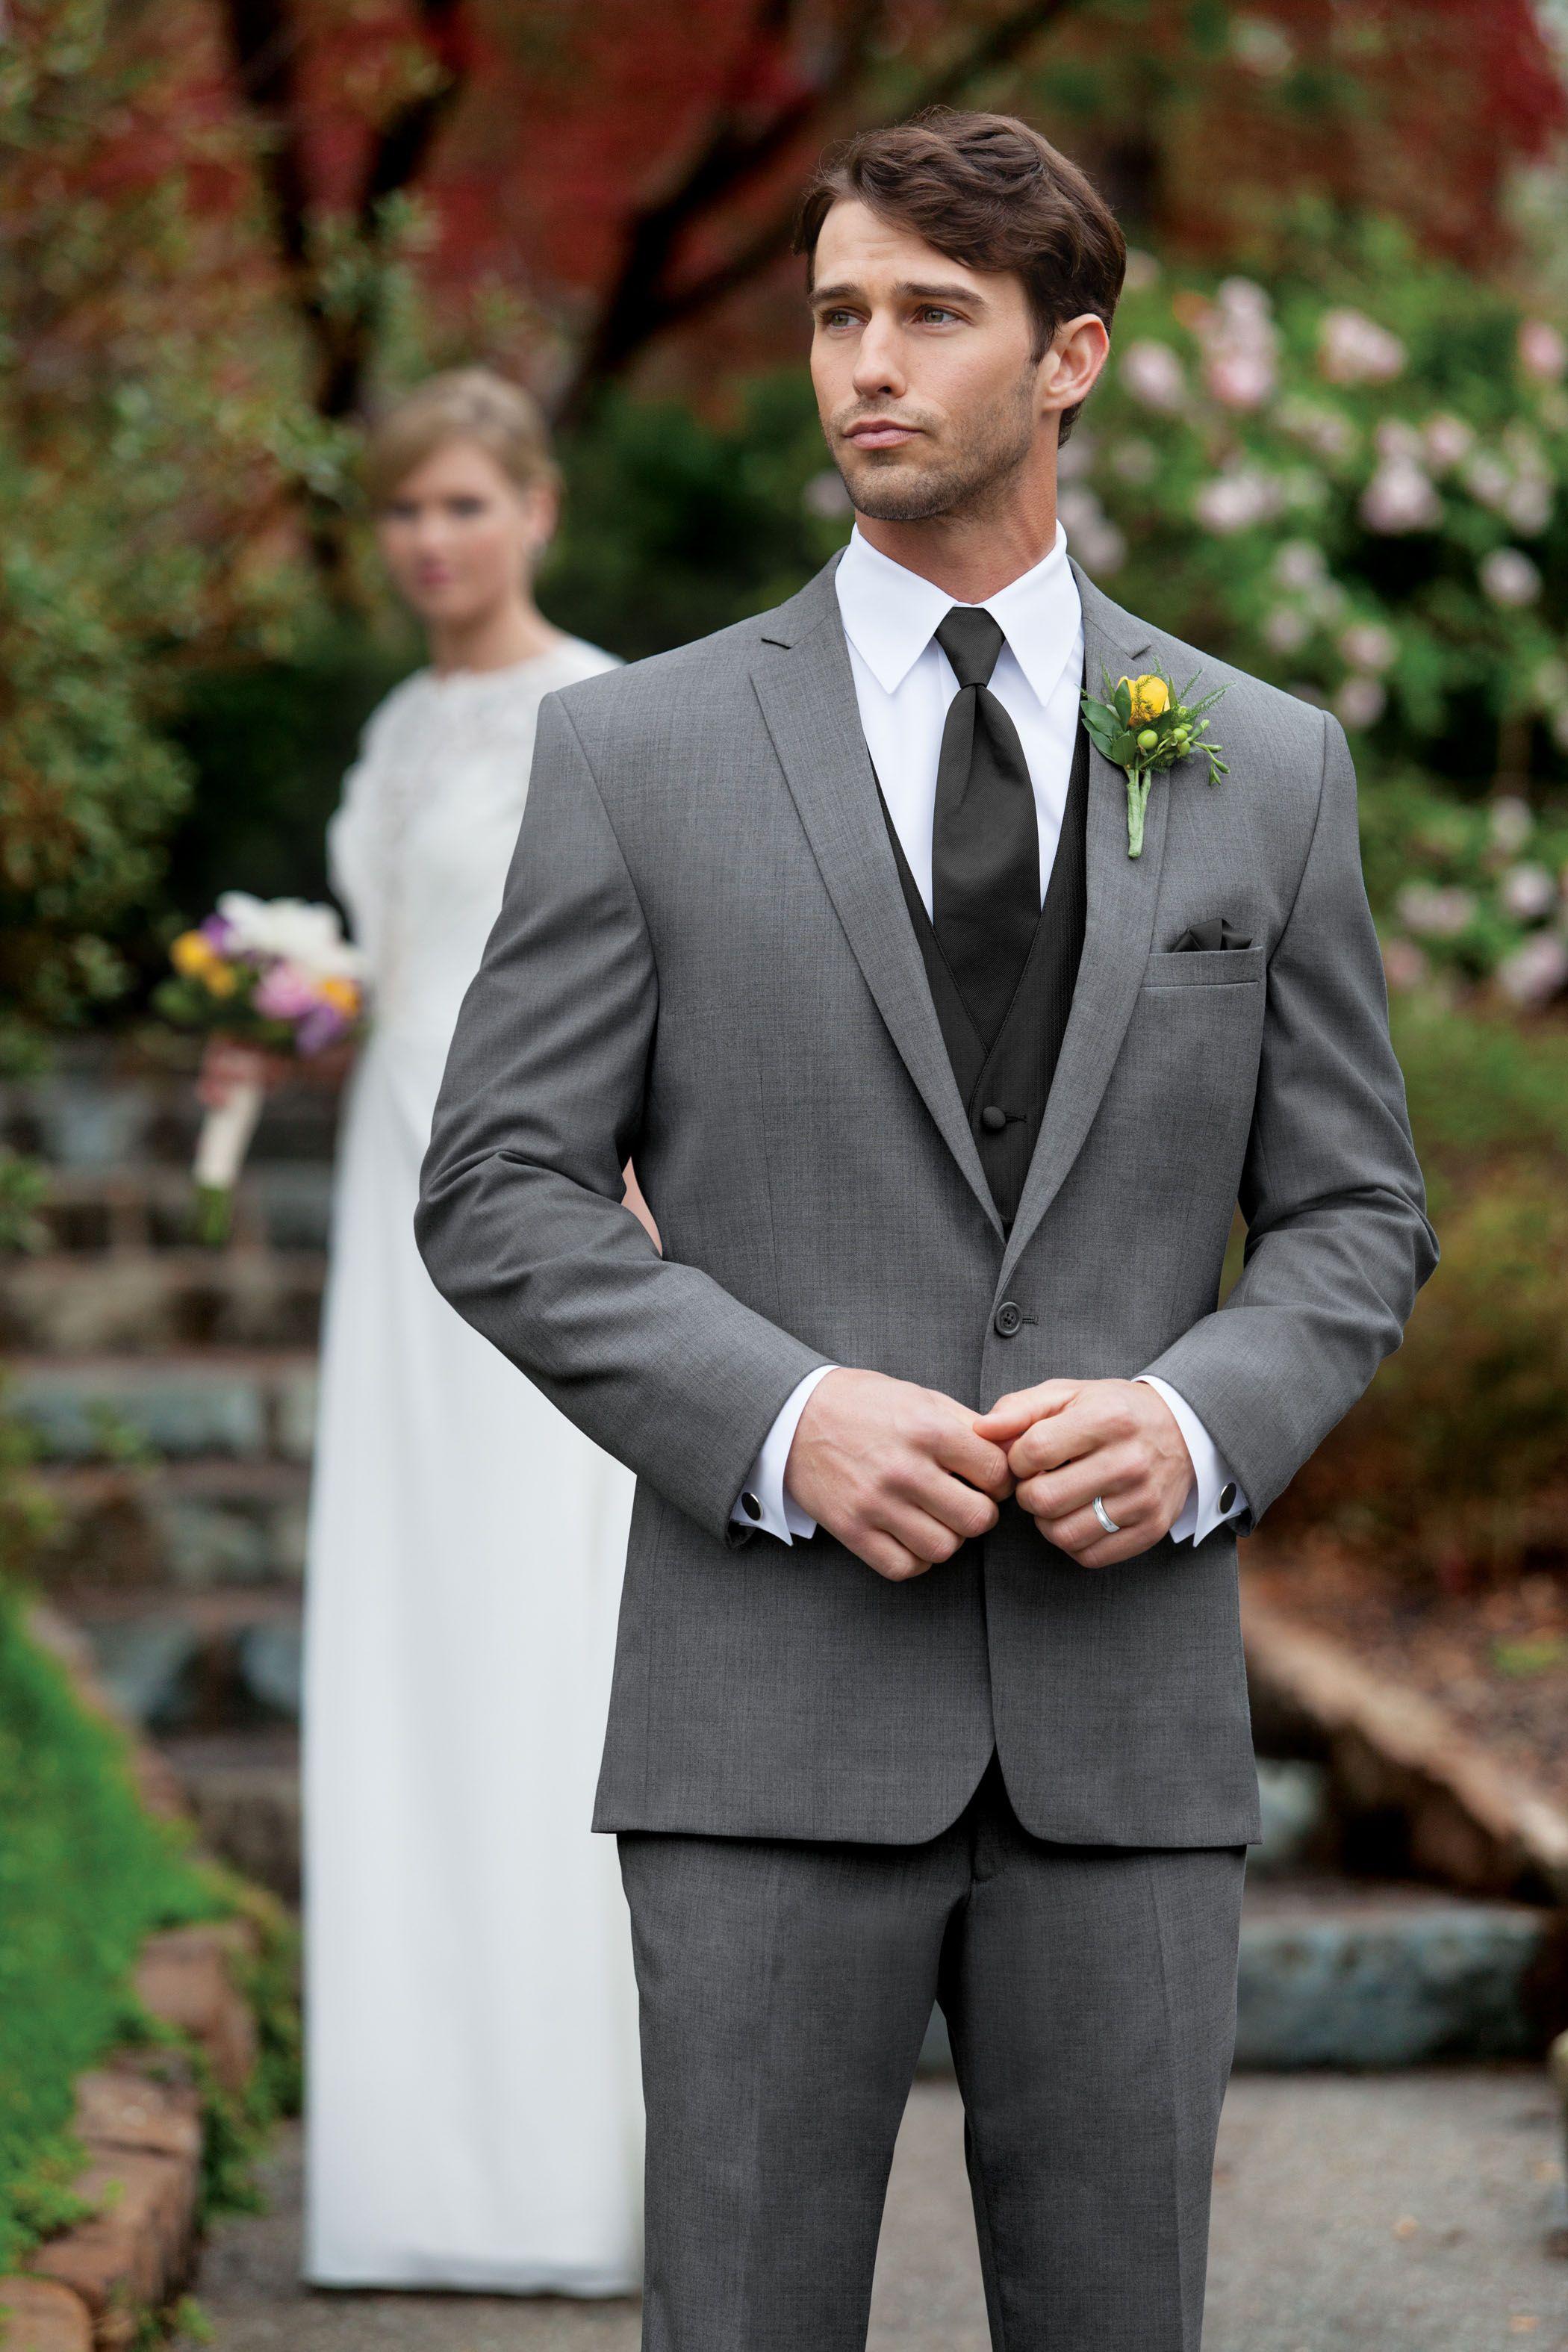 Dillon Tuxedo in Medium Grey Wedding suit styles